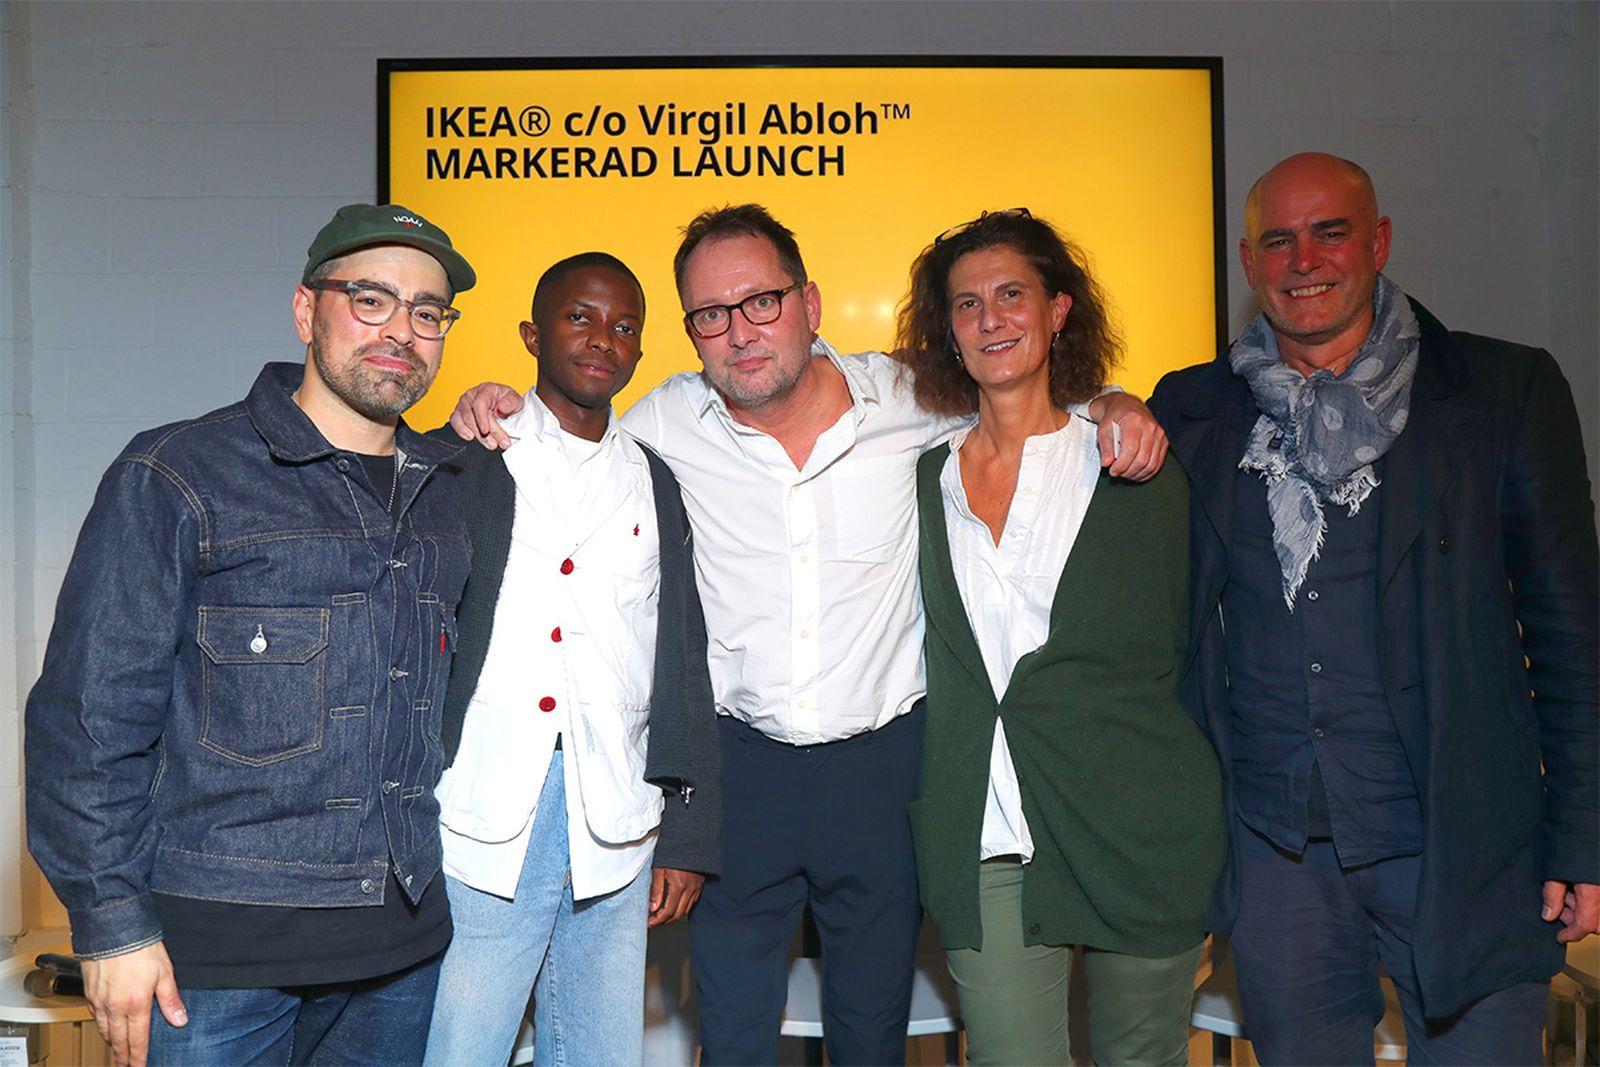 Left to right: Jeff Carvalho, Tawanda Chiweshe, Henrik Most, Galia Solomonoff, Alfred Zollinger